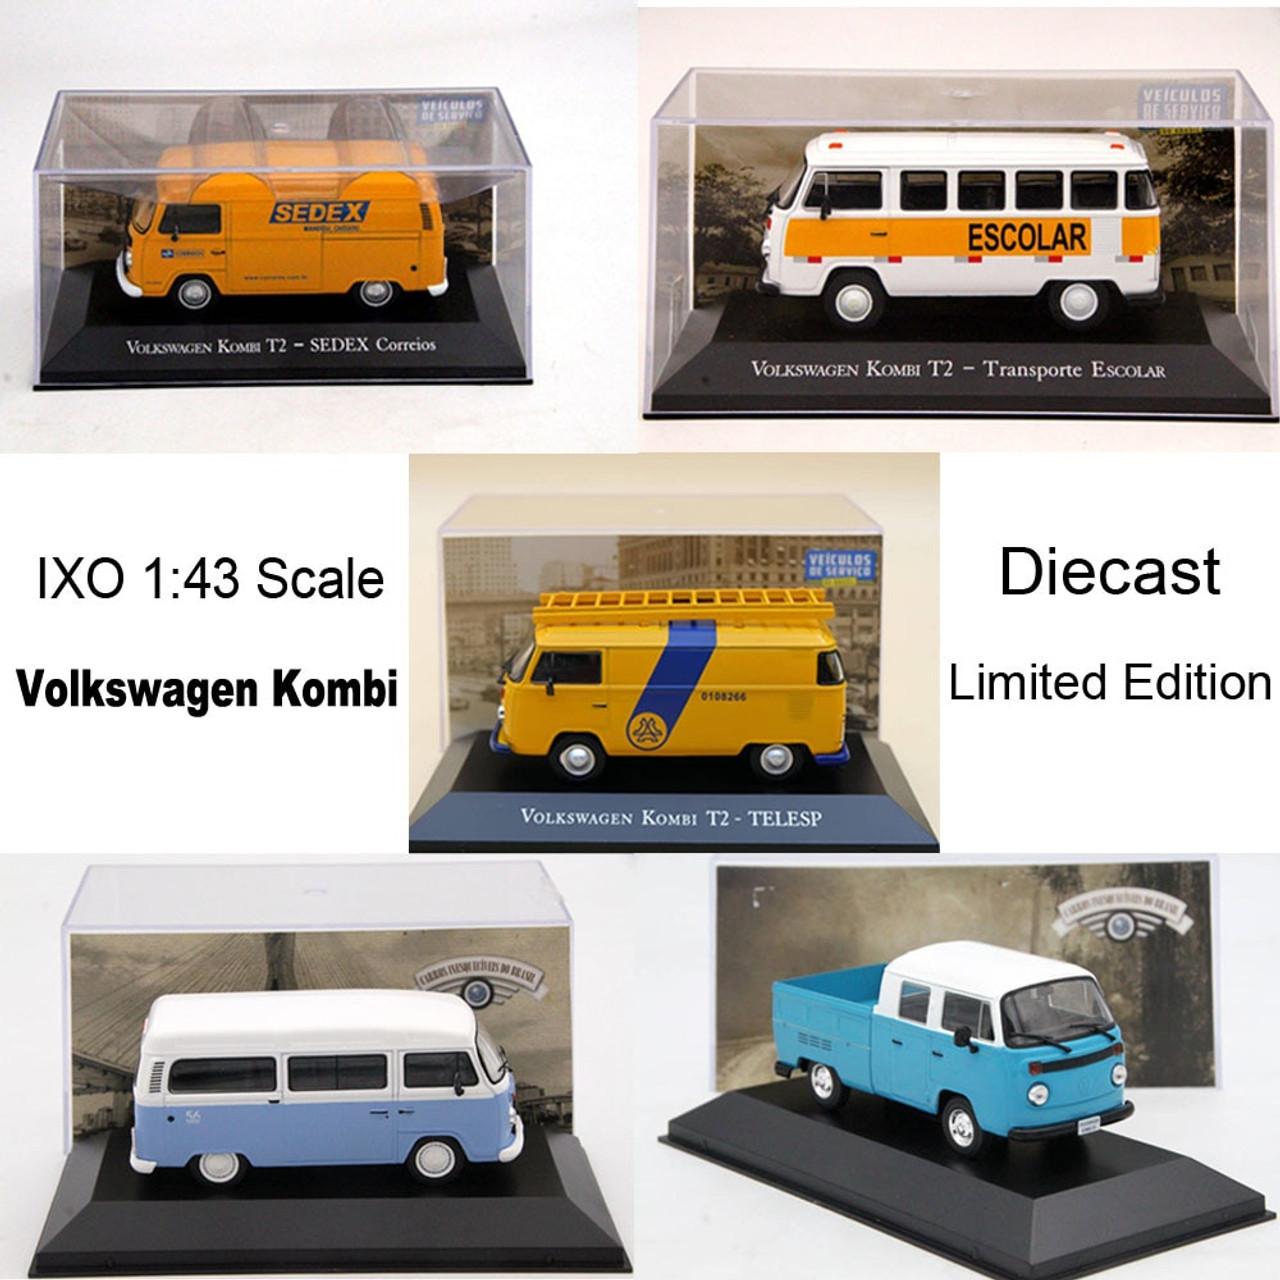 IXO 1:43 VW Voyage//Bizorrao//Gol//Santana//Passat//Fusca//Saveiro Diecast Models Toys